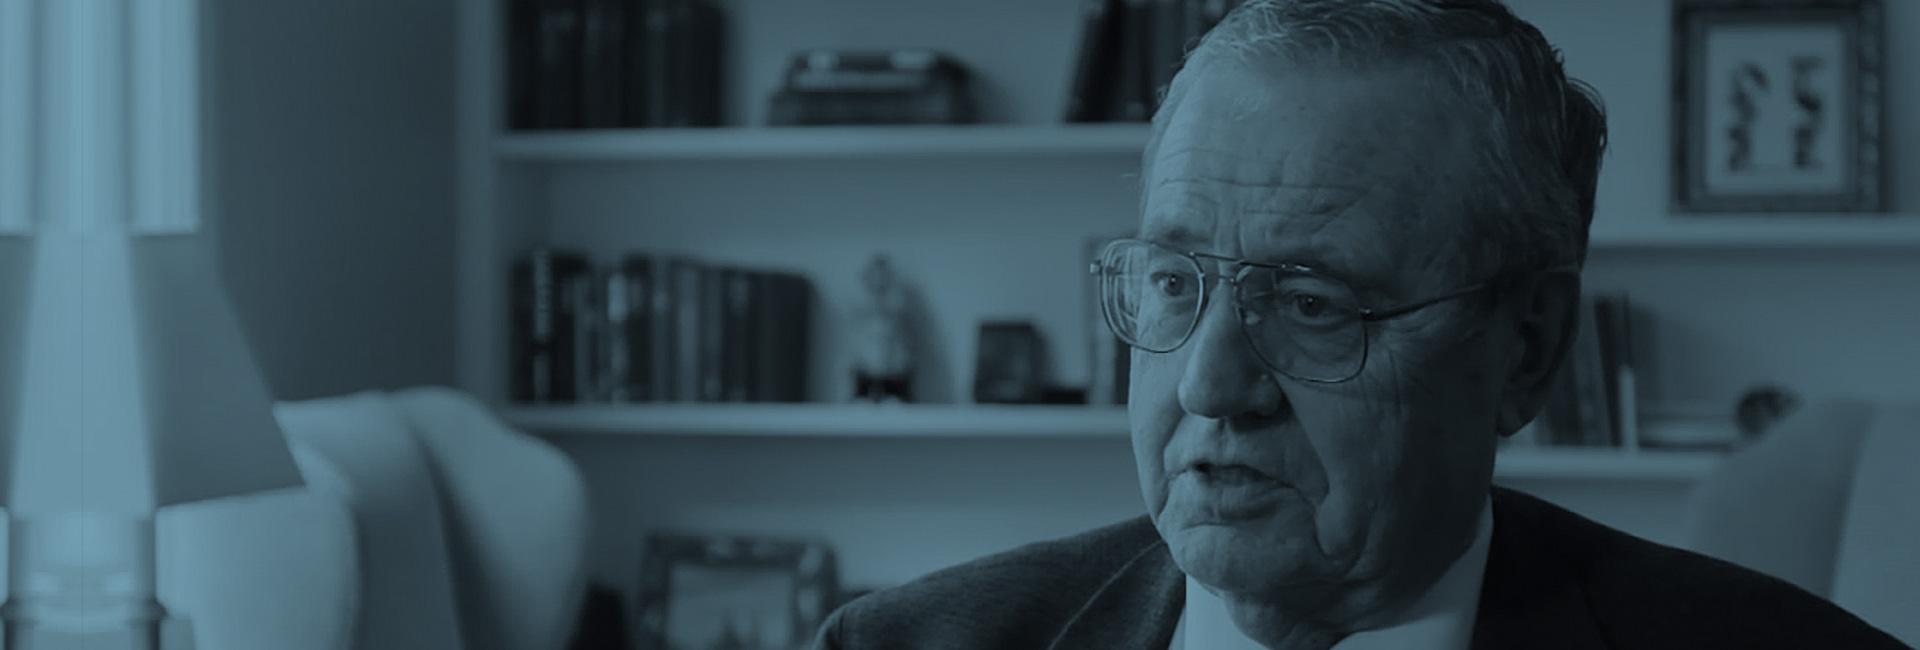 Dallas Willard. September 4, 1935 to May 8, 2013